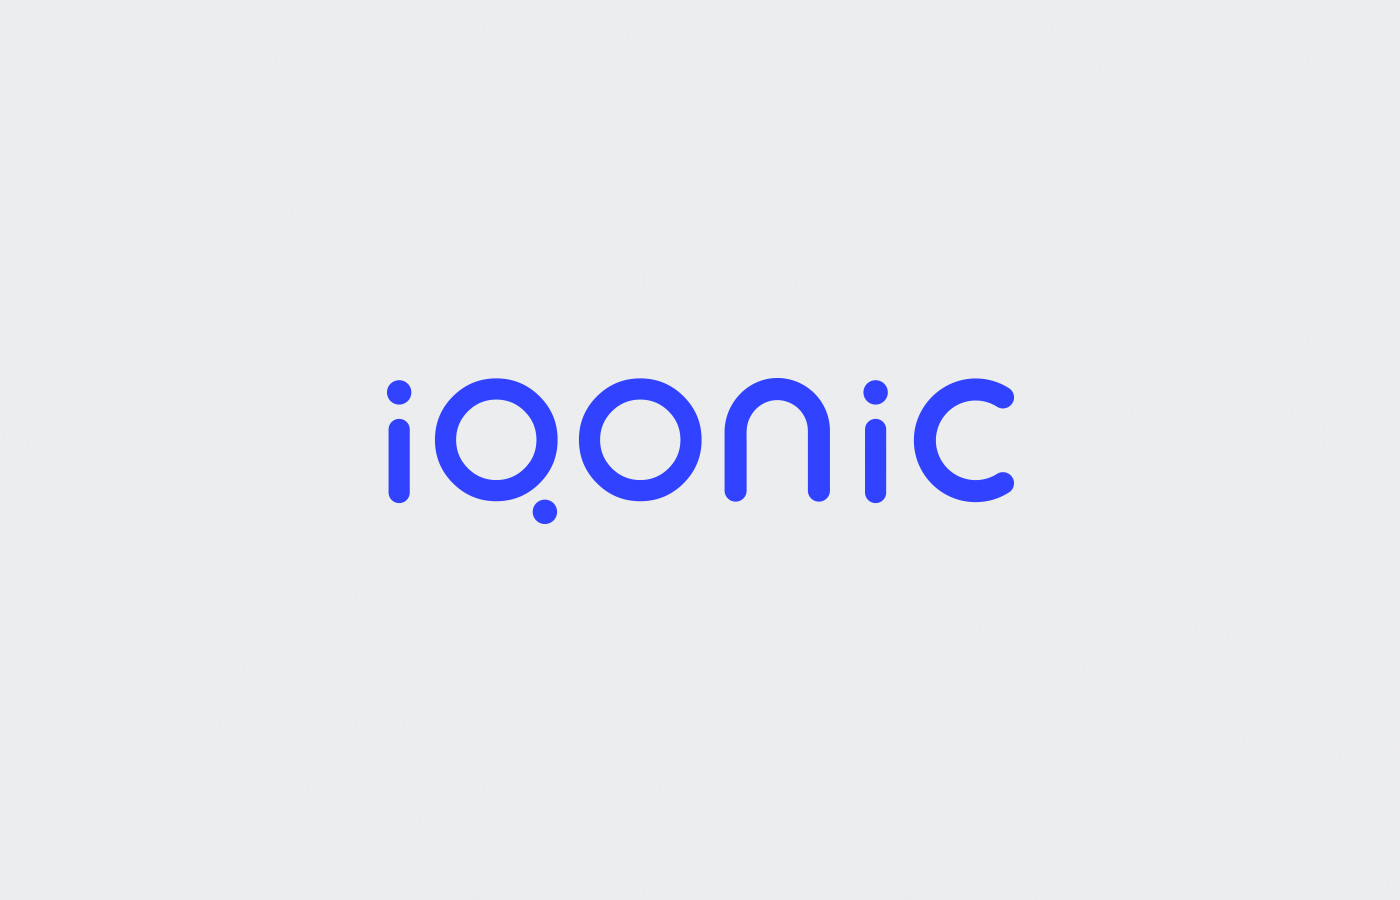 Logo design for Iqonic by Alevtyna Makovska 2